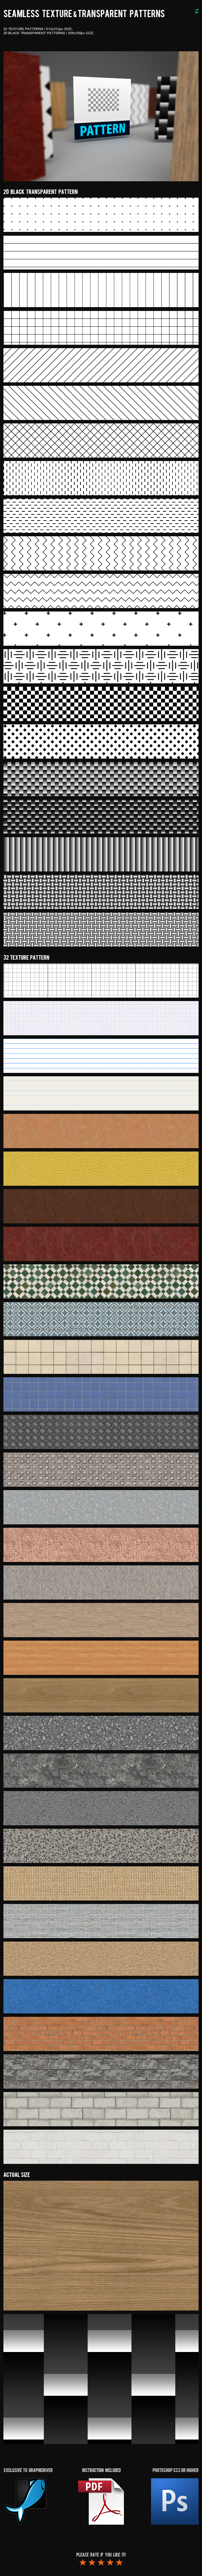 Seamless Texture & Transparent Patterns - Textures / Fills / Patterns Photoshop